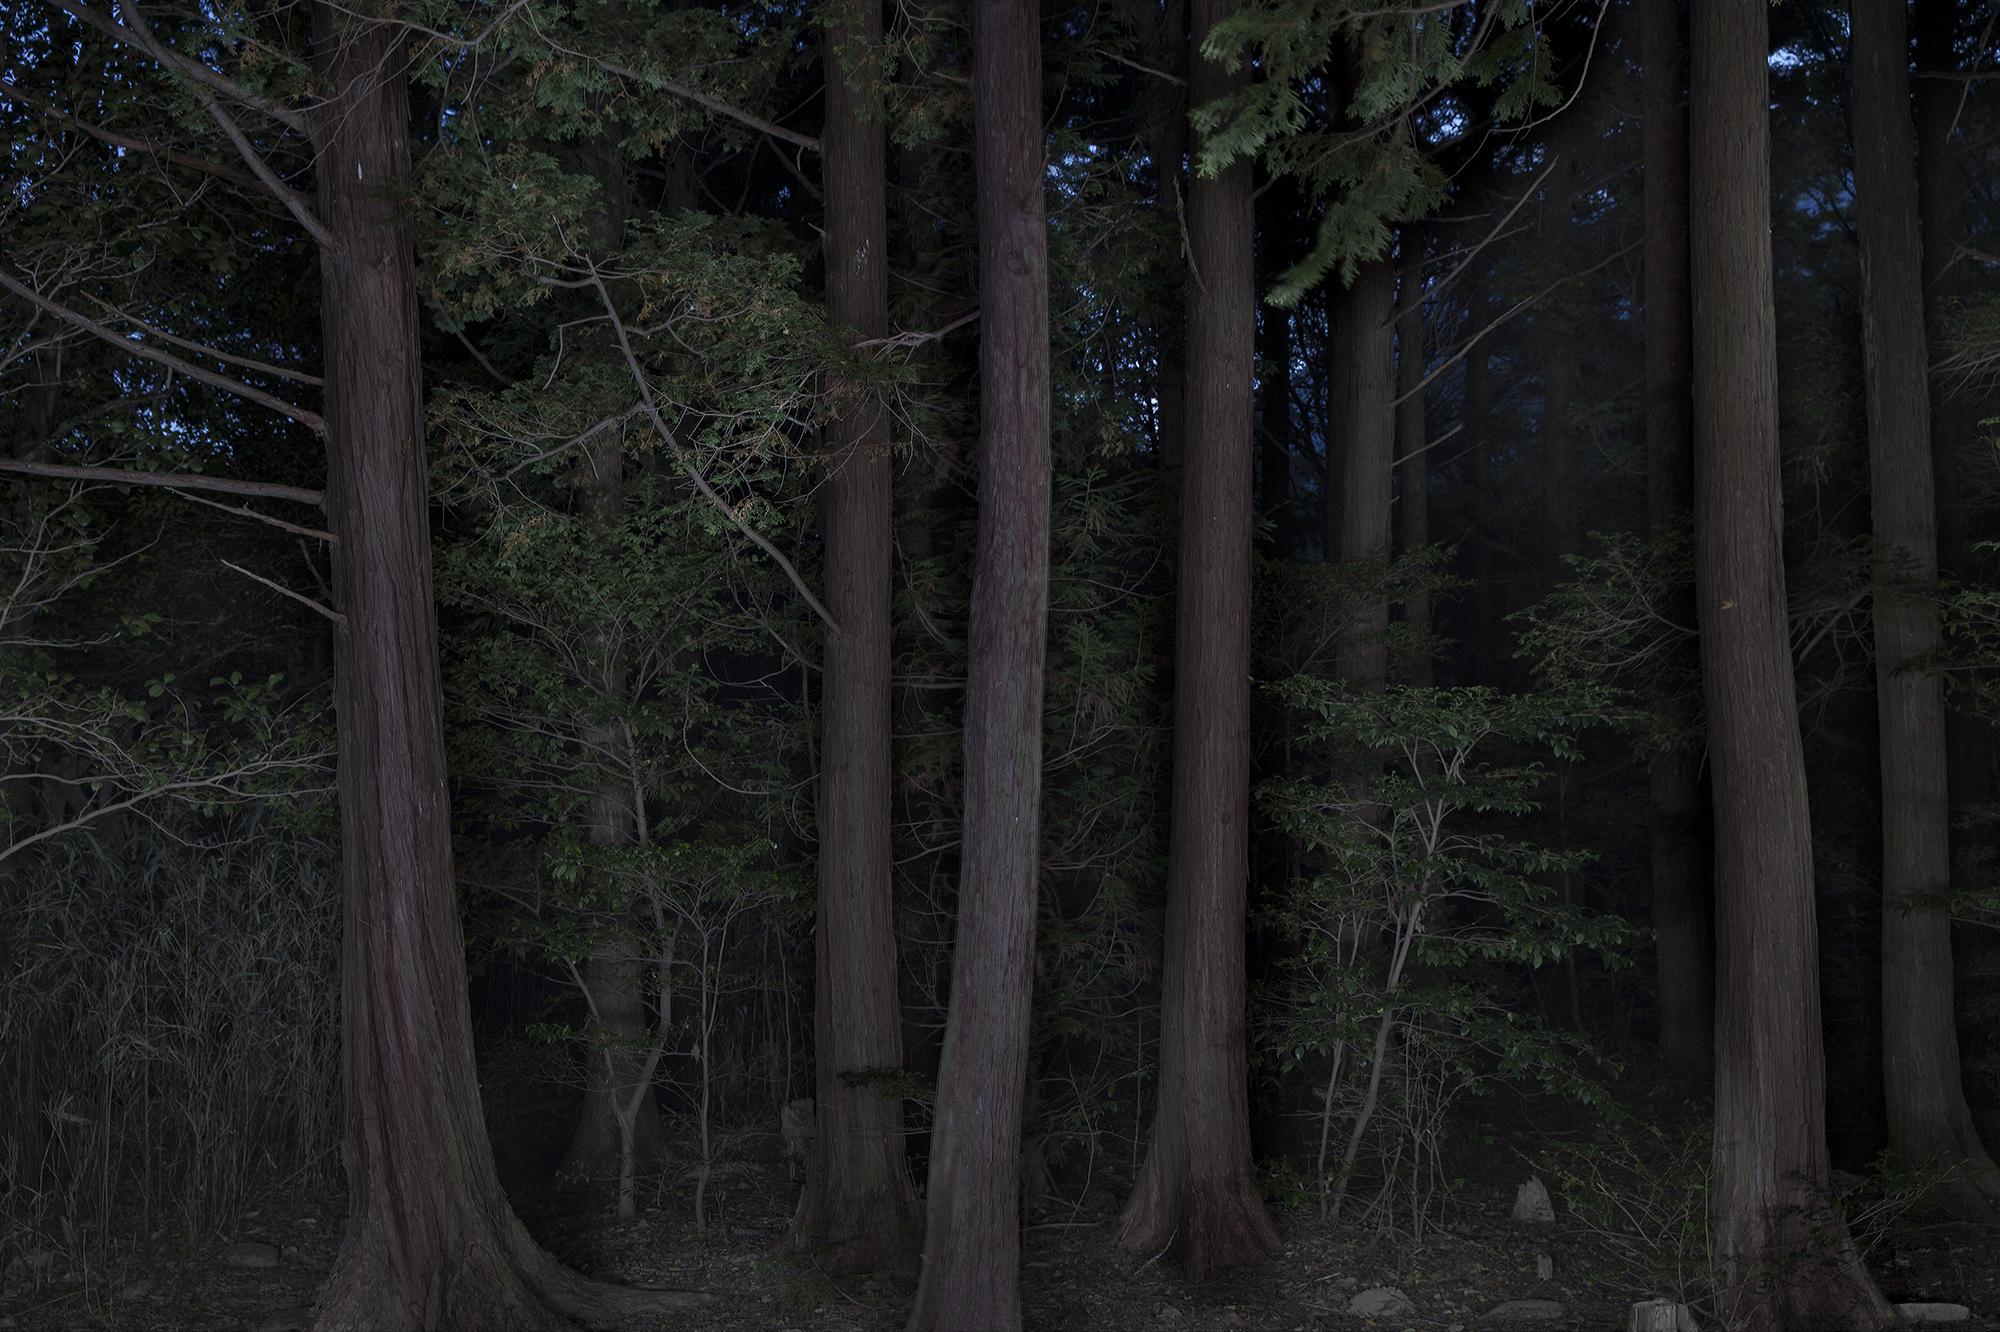 Taejoong Kim, Foresta #7, 2013.